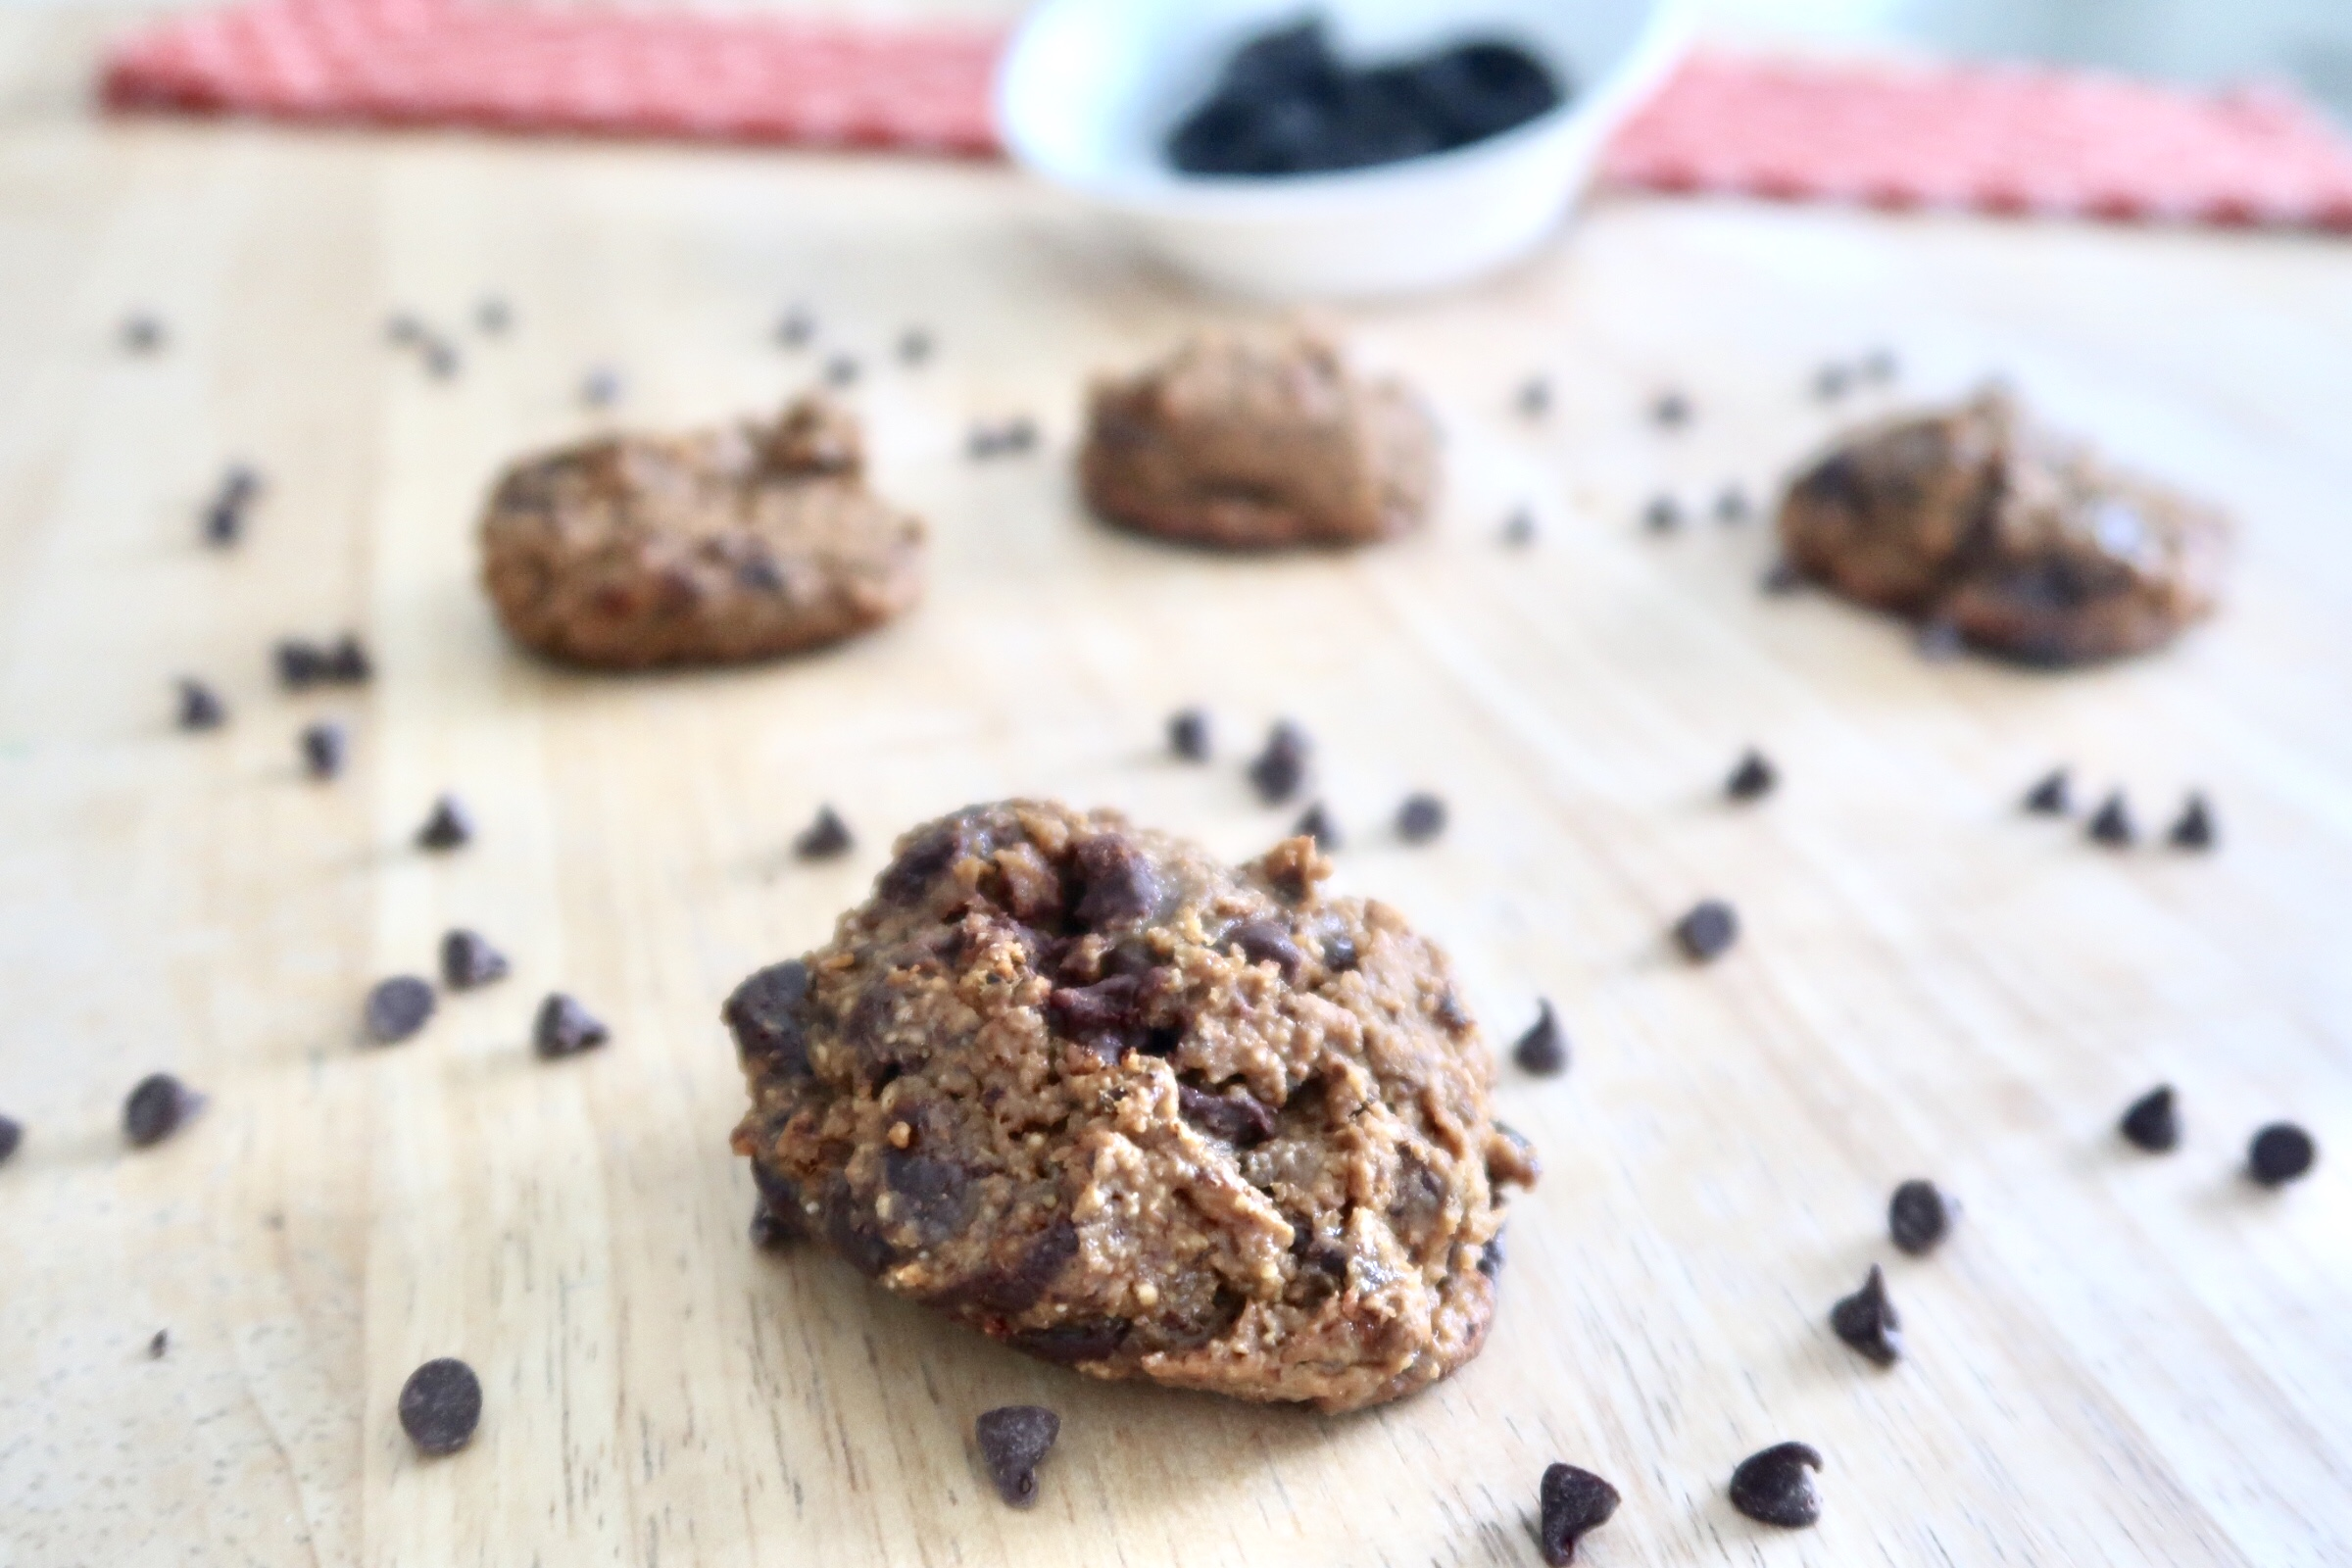 Low sugar Chocolate Chip Prune Cookie Recipe